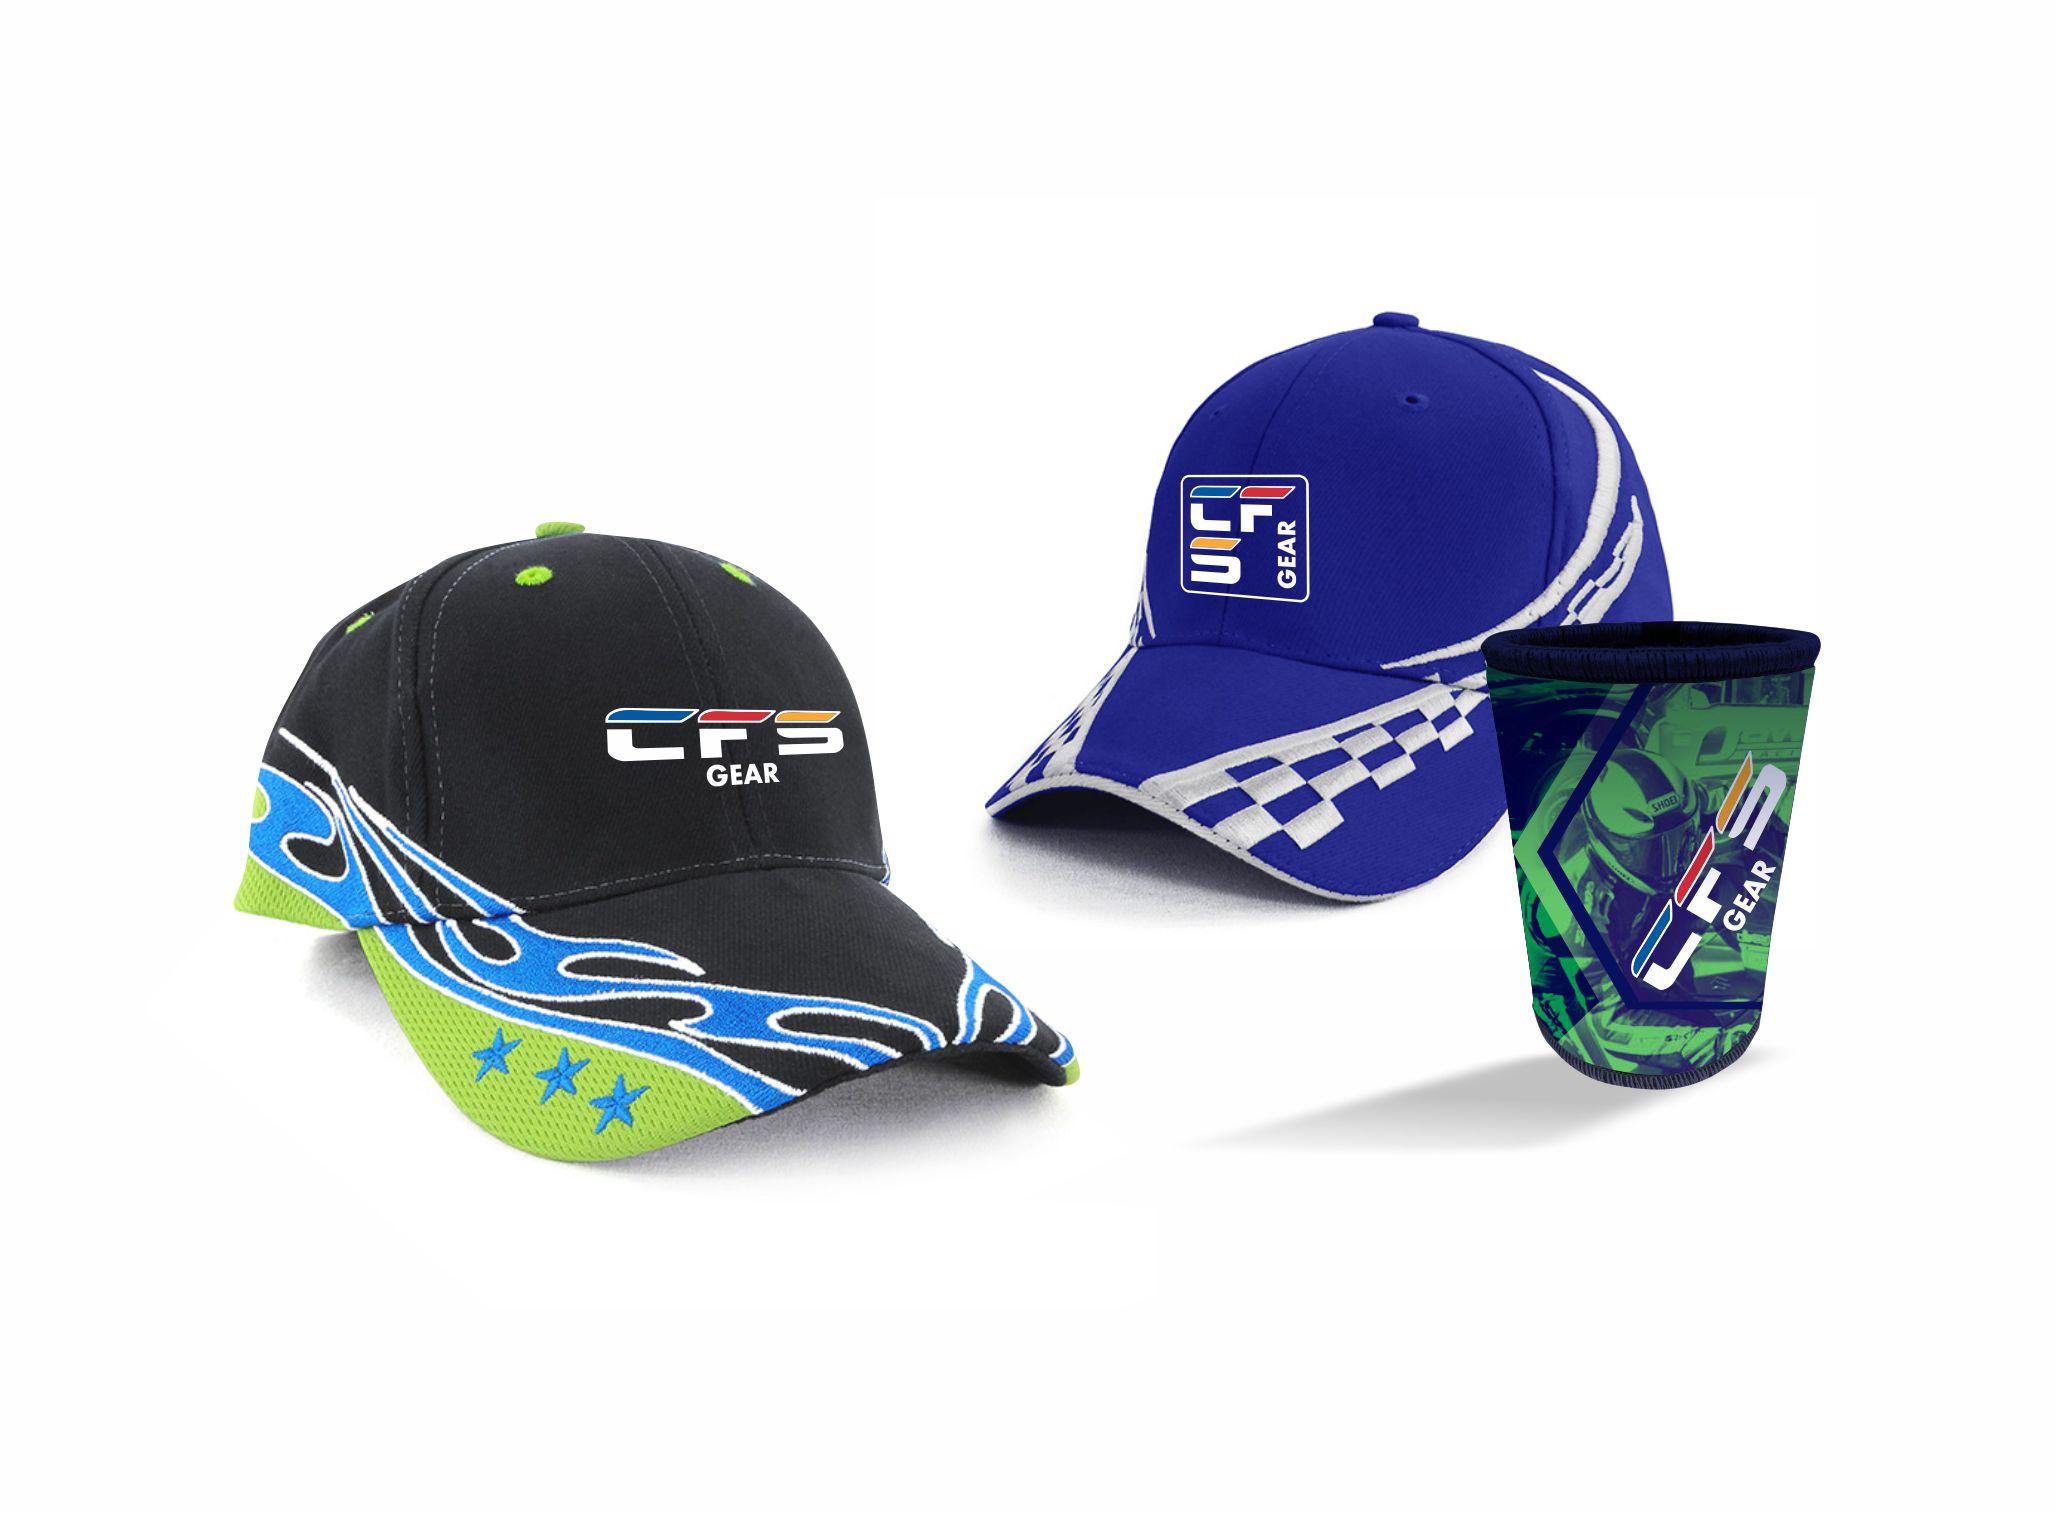 Motorsportscaps